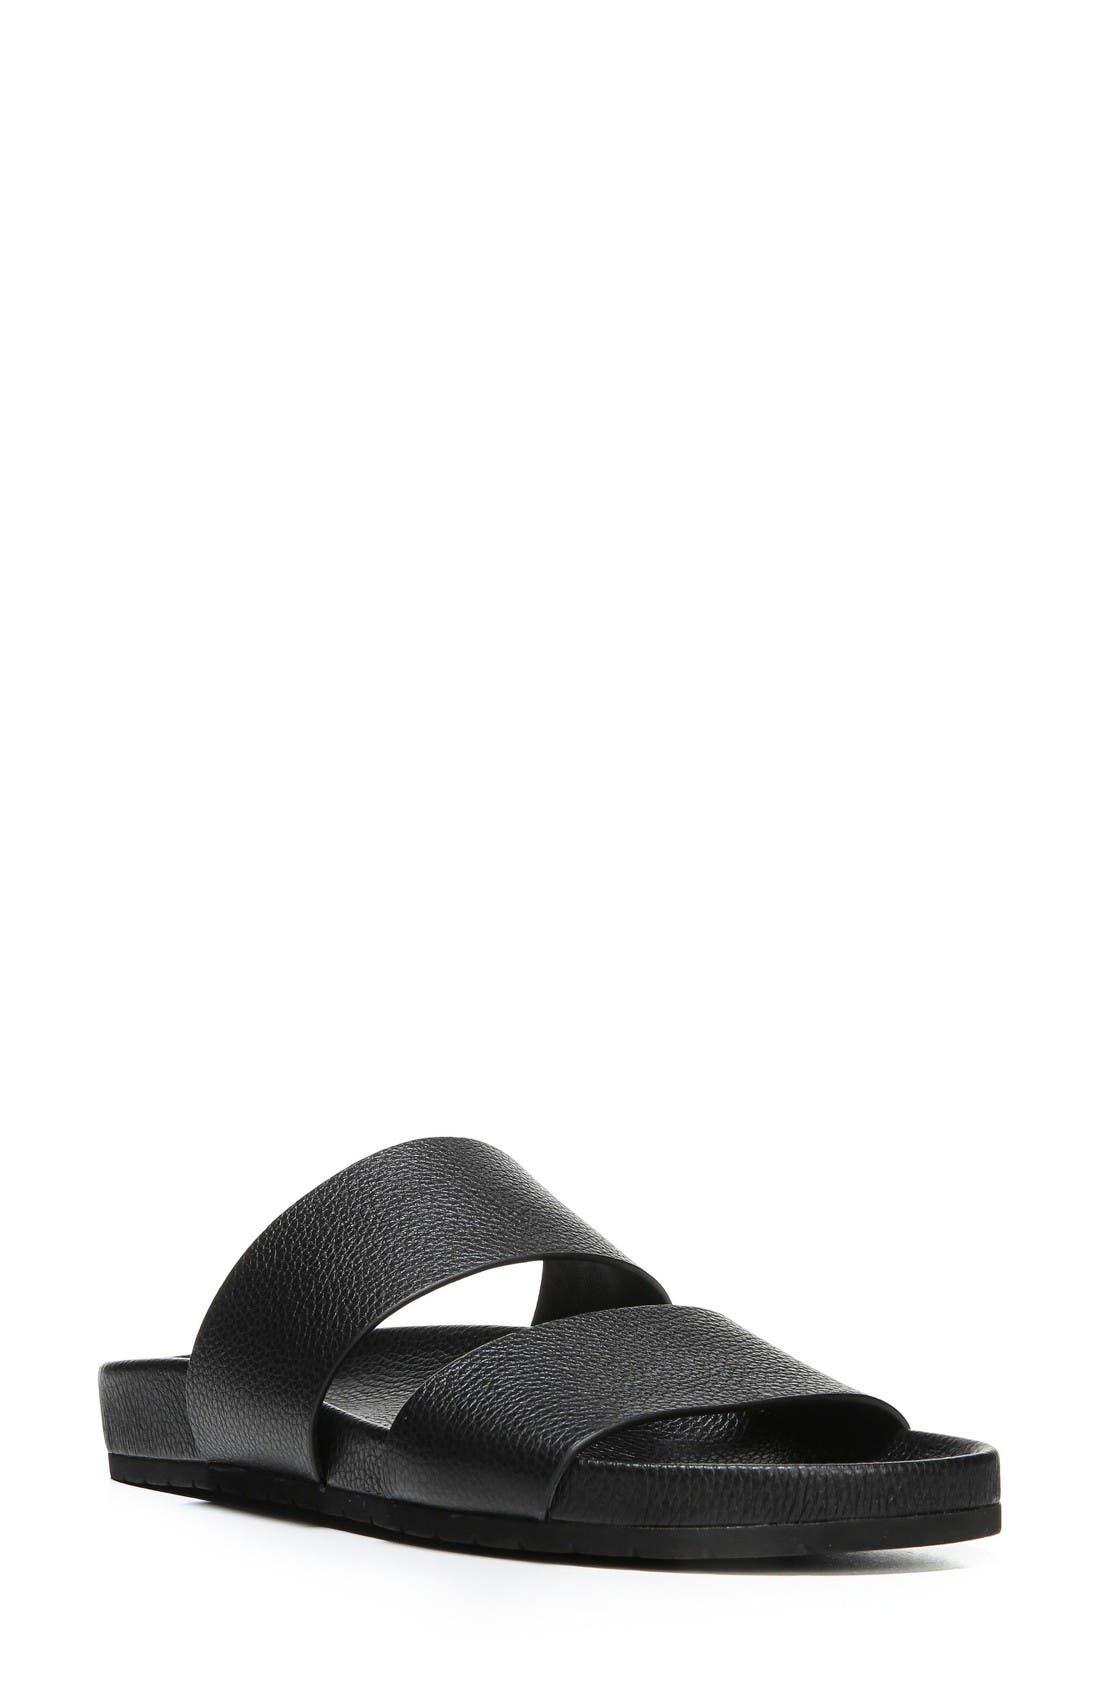 Alternate Image 1 Selected - Vince Georgie Slide Sandal (Women)